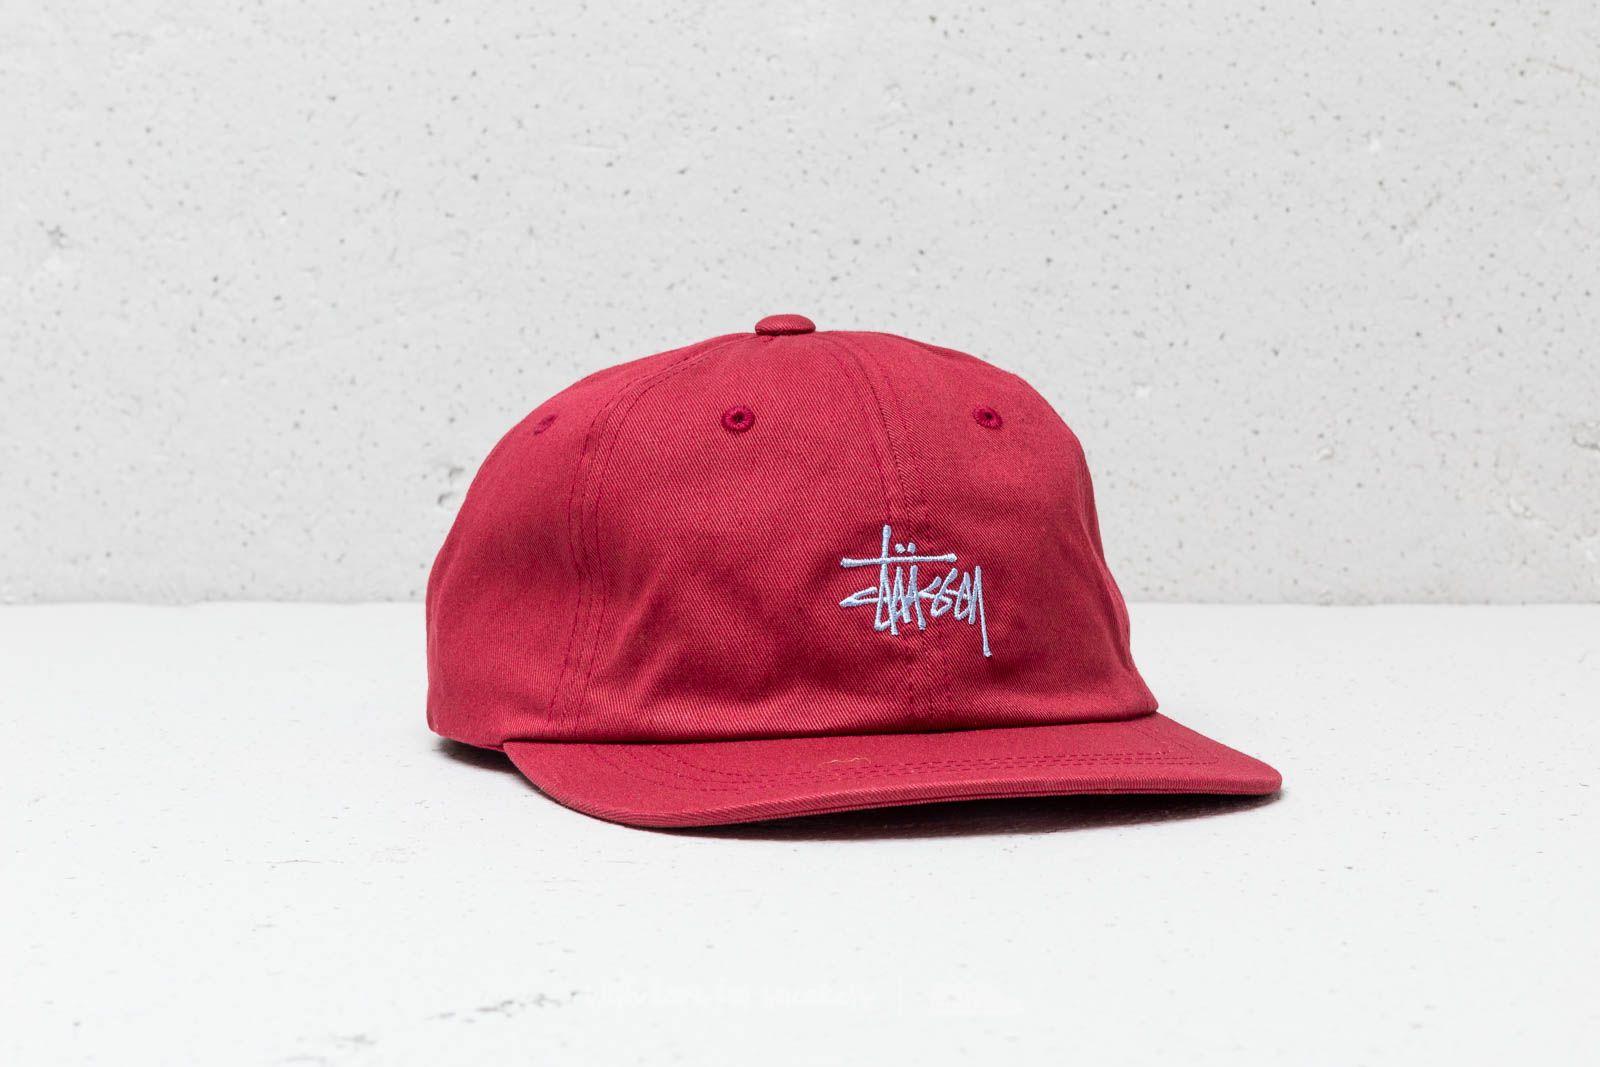 2bcdd5f0e8e Stüssy Stock Low Pro Cap Red